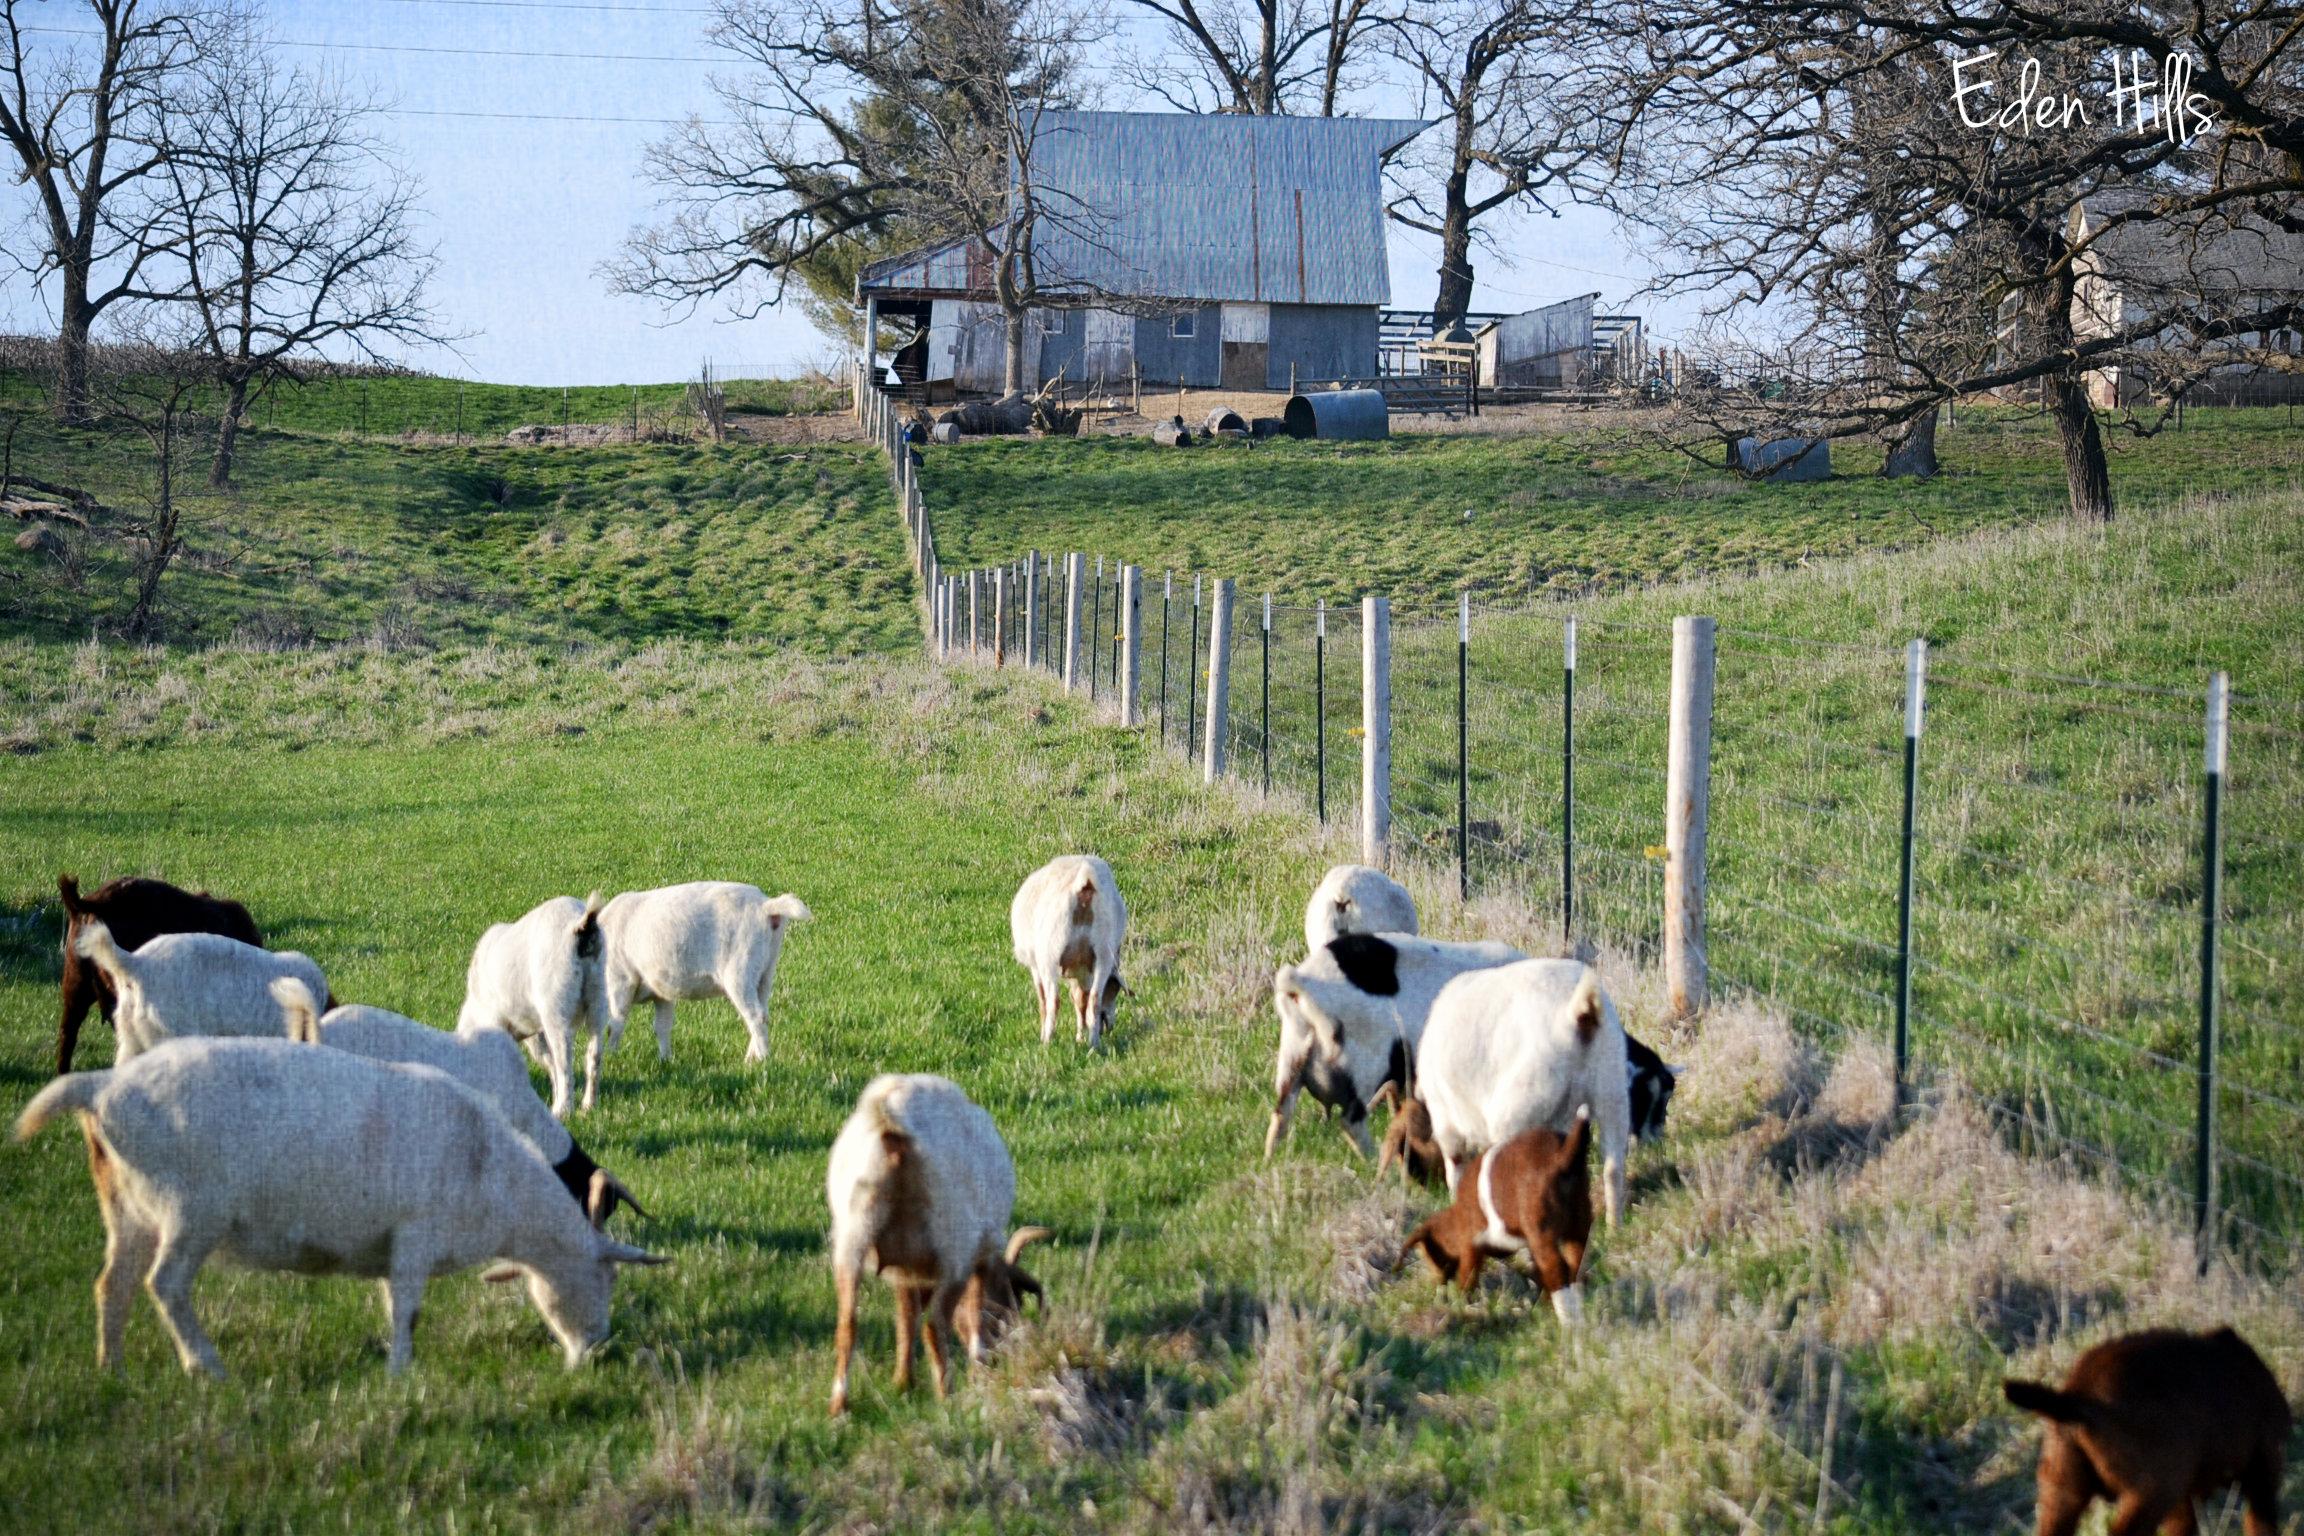 From The Farm Blog Hop Eden Hills